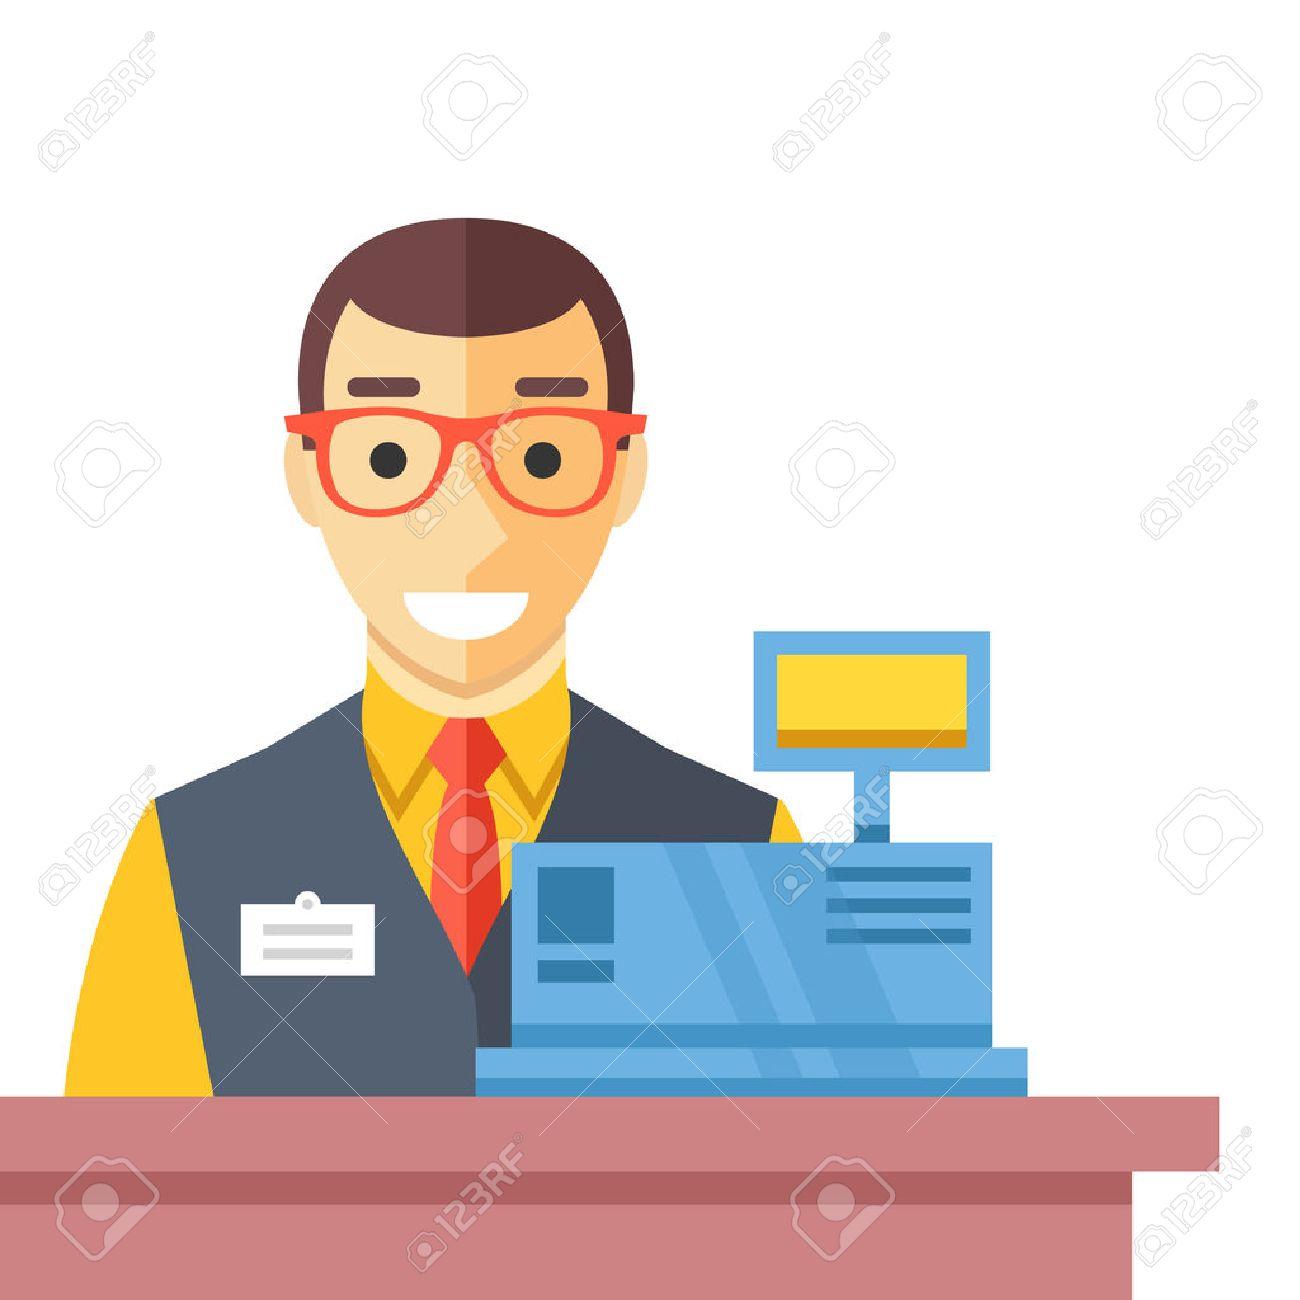 Cashier man at checkout counter. Counter desk, cash register and happy clerk. Flat vector illustration - 56655211